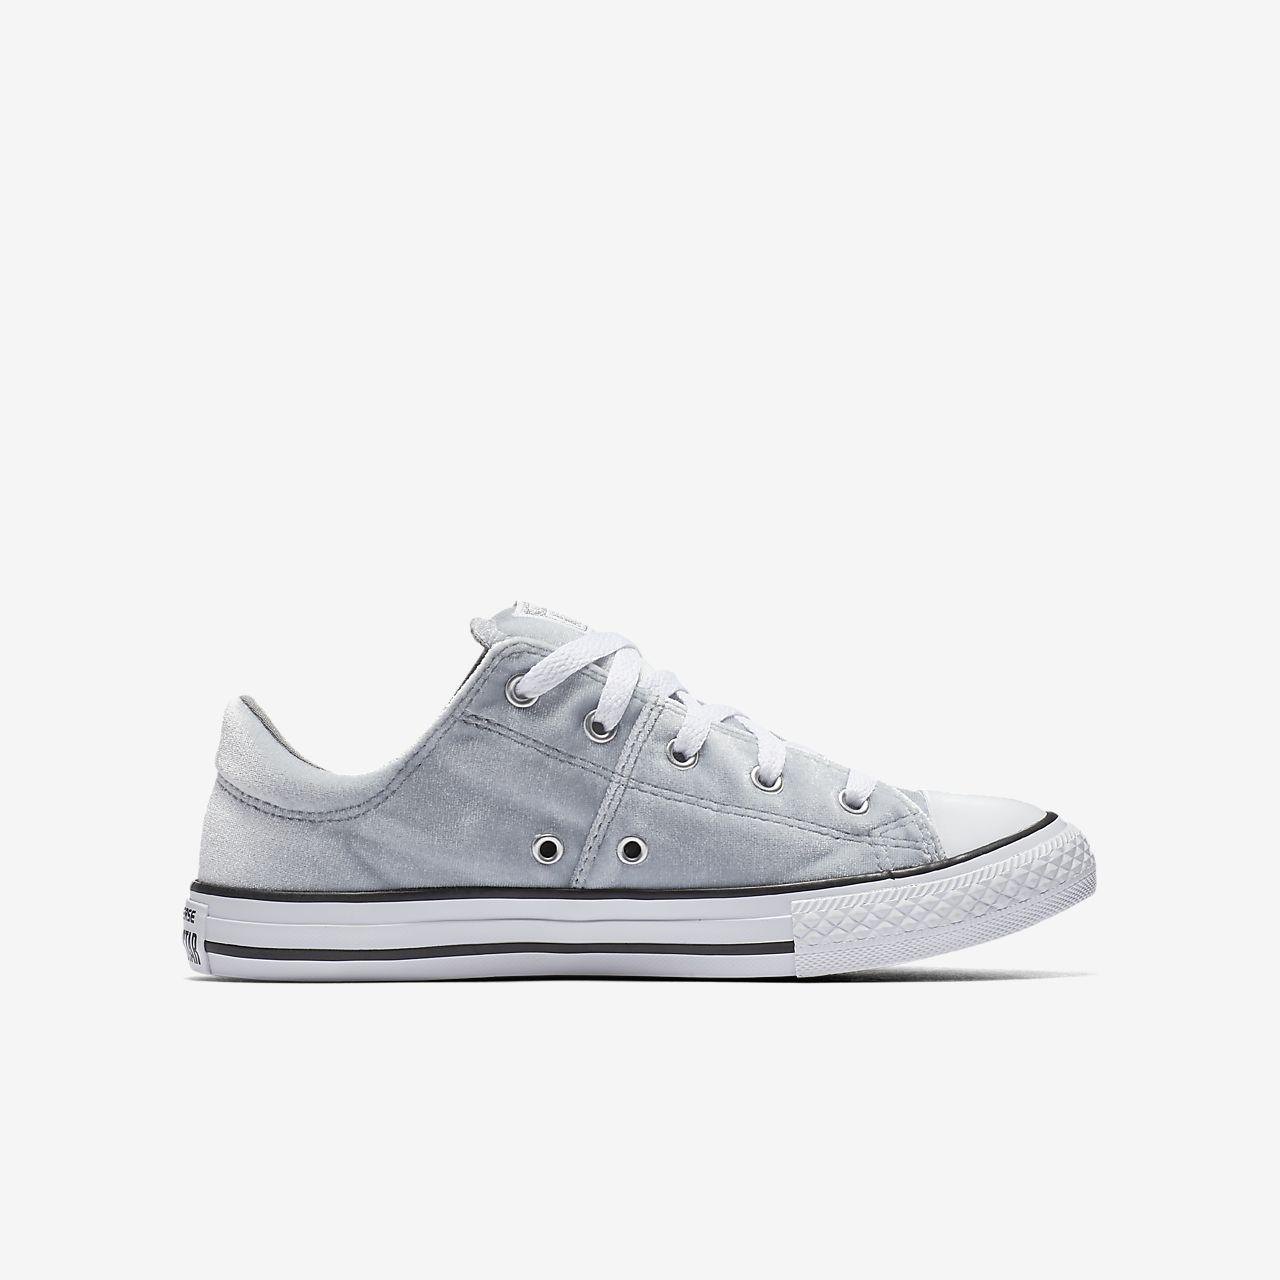 ... Converse Chuck Taylor All Star Madison Velvet Low Top Big Kids Shoe